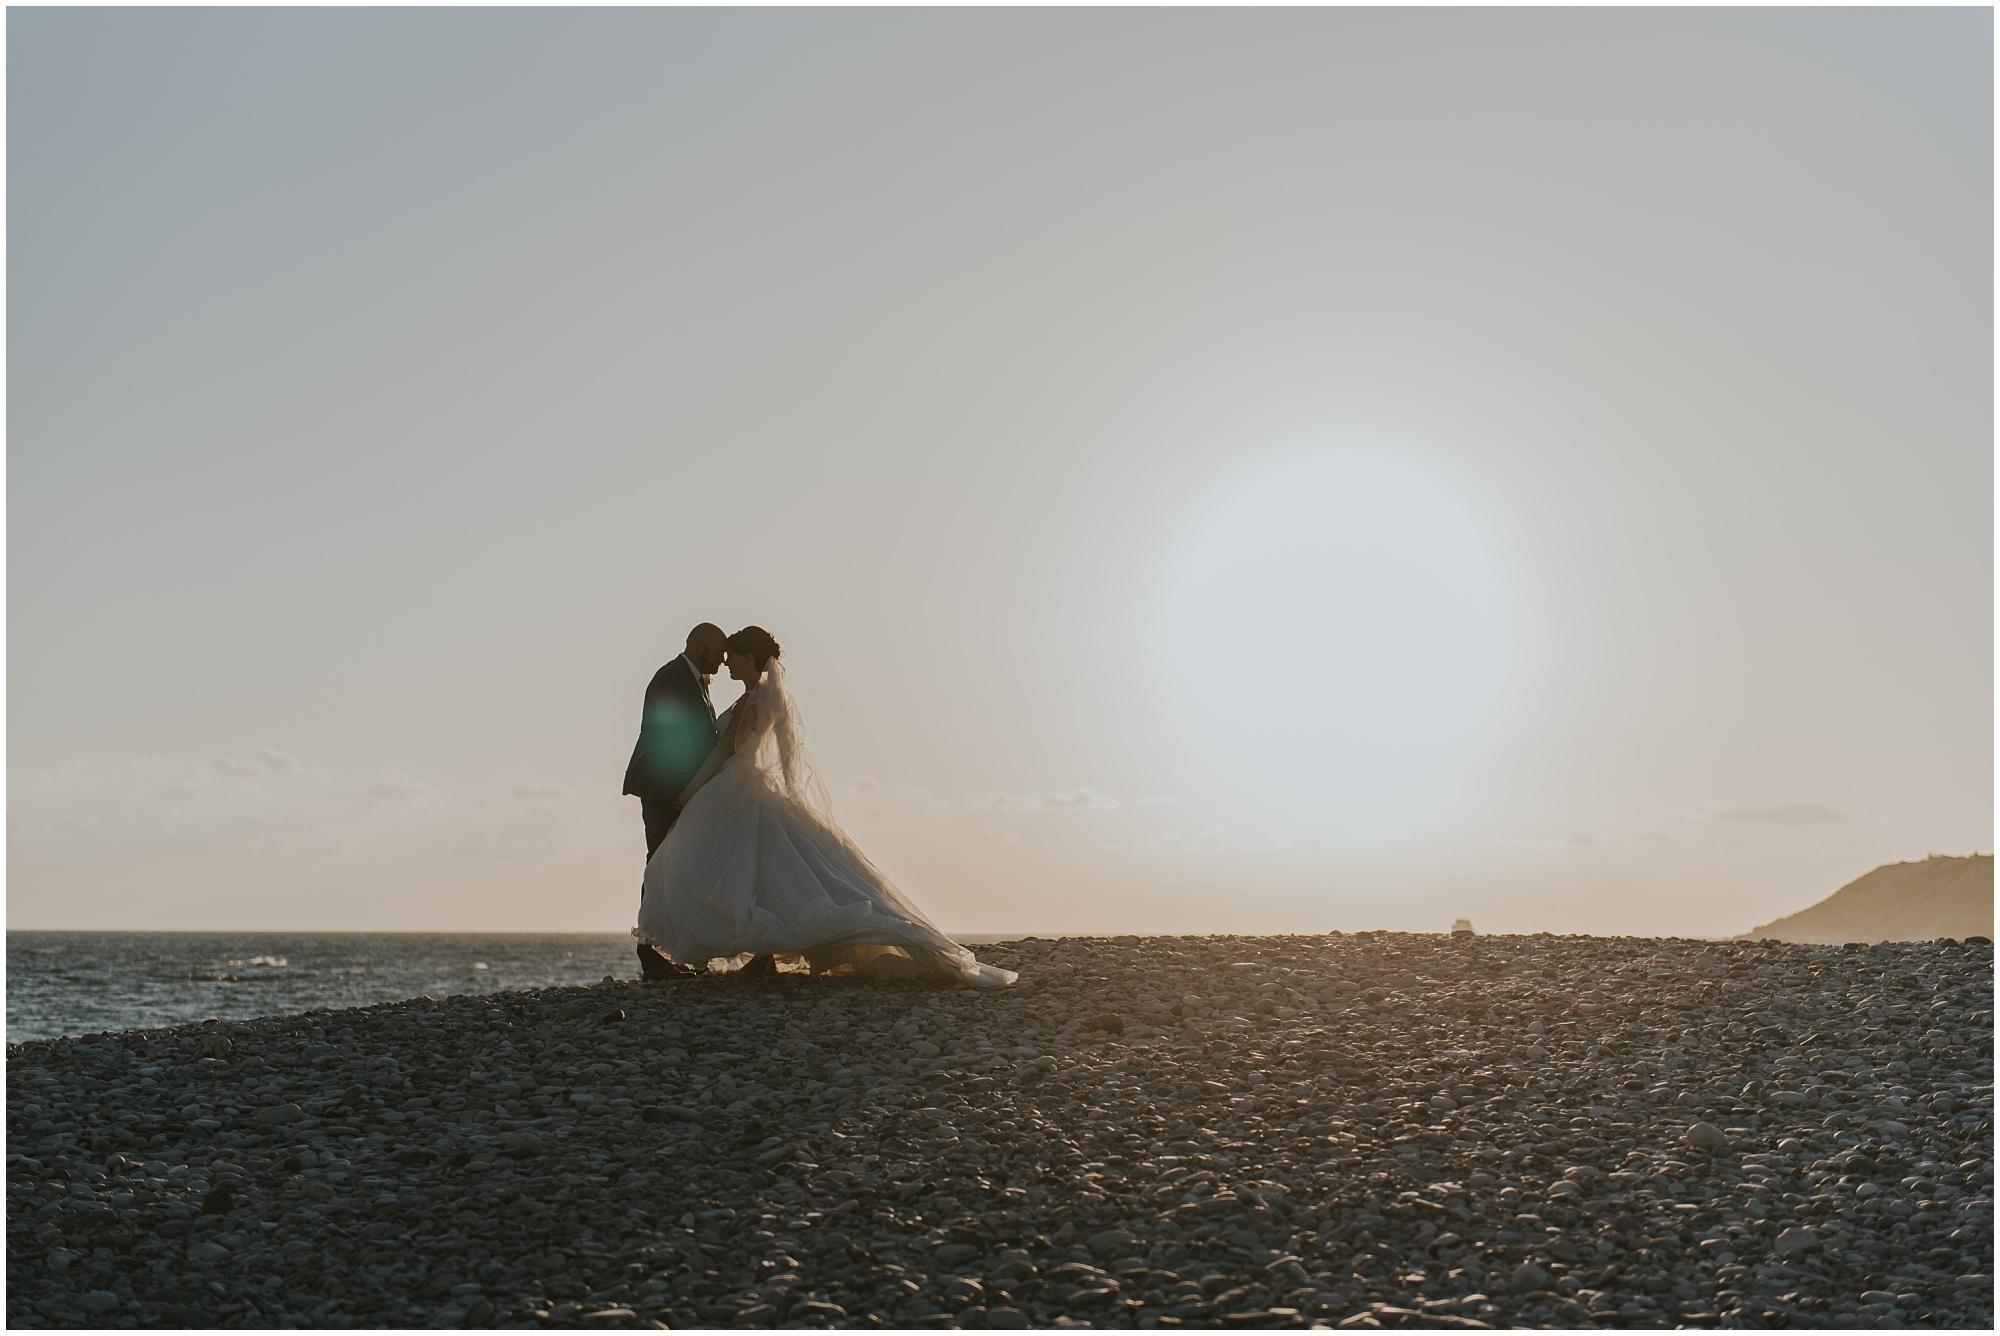 cyprus bride and groom